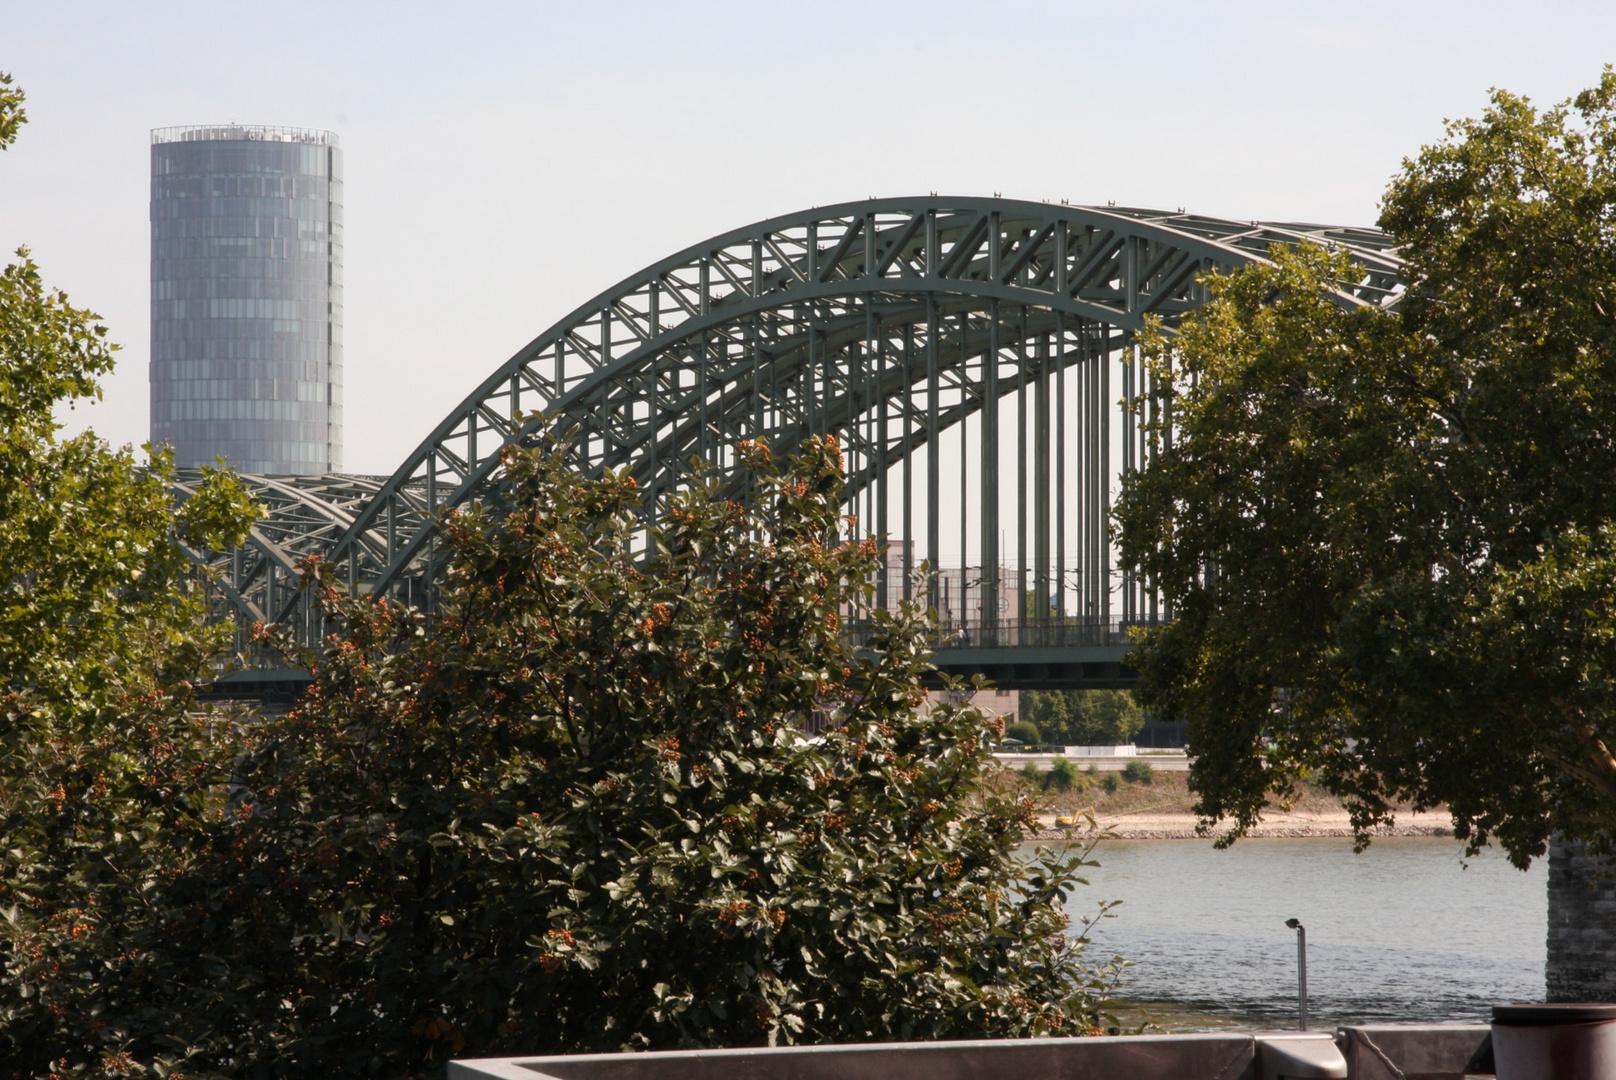 Hohenzollernbrücke mal anders